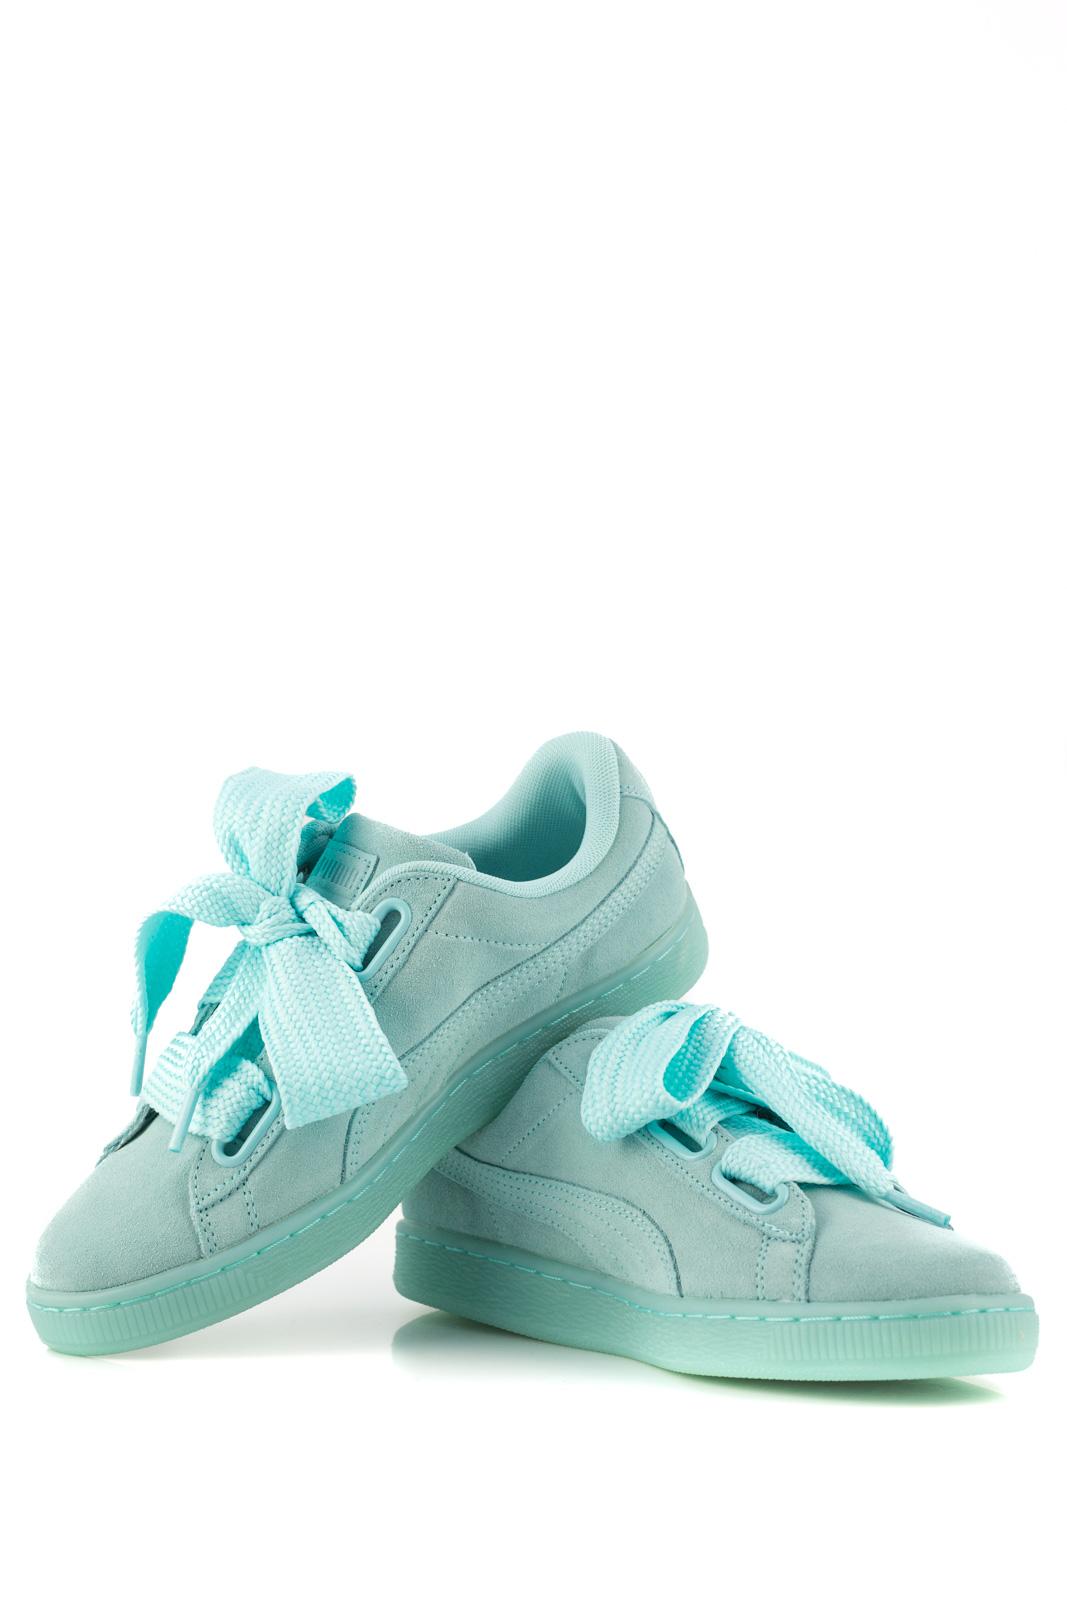 Puma Suede Heart Reset Blue Celesti Calibro Shop